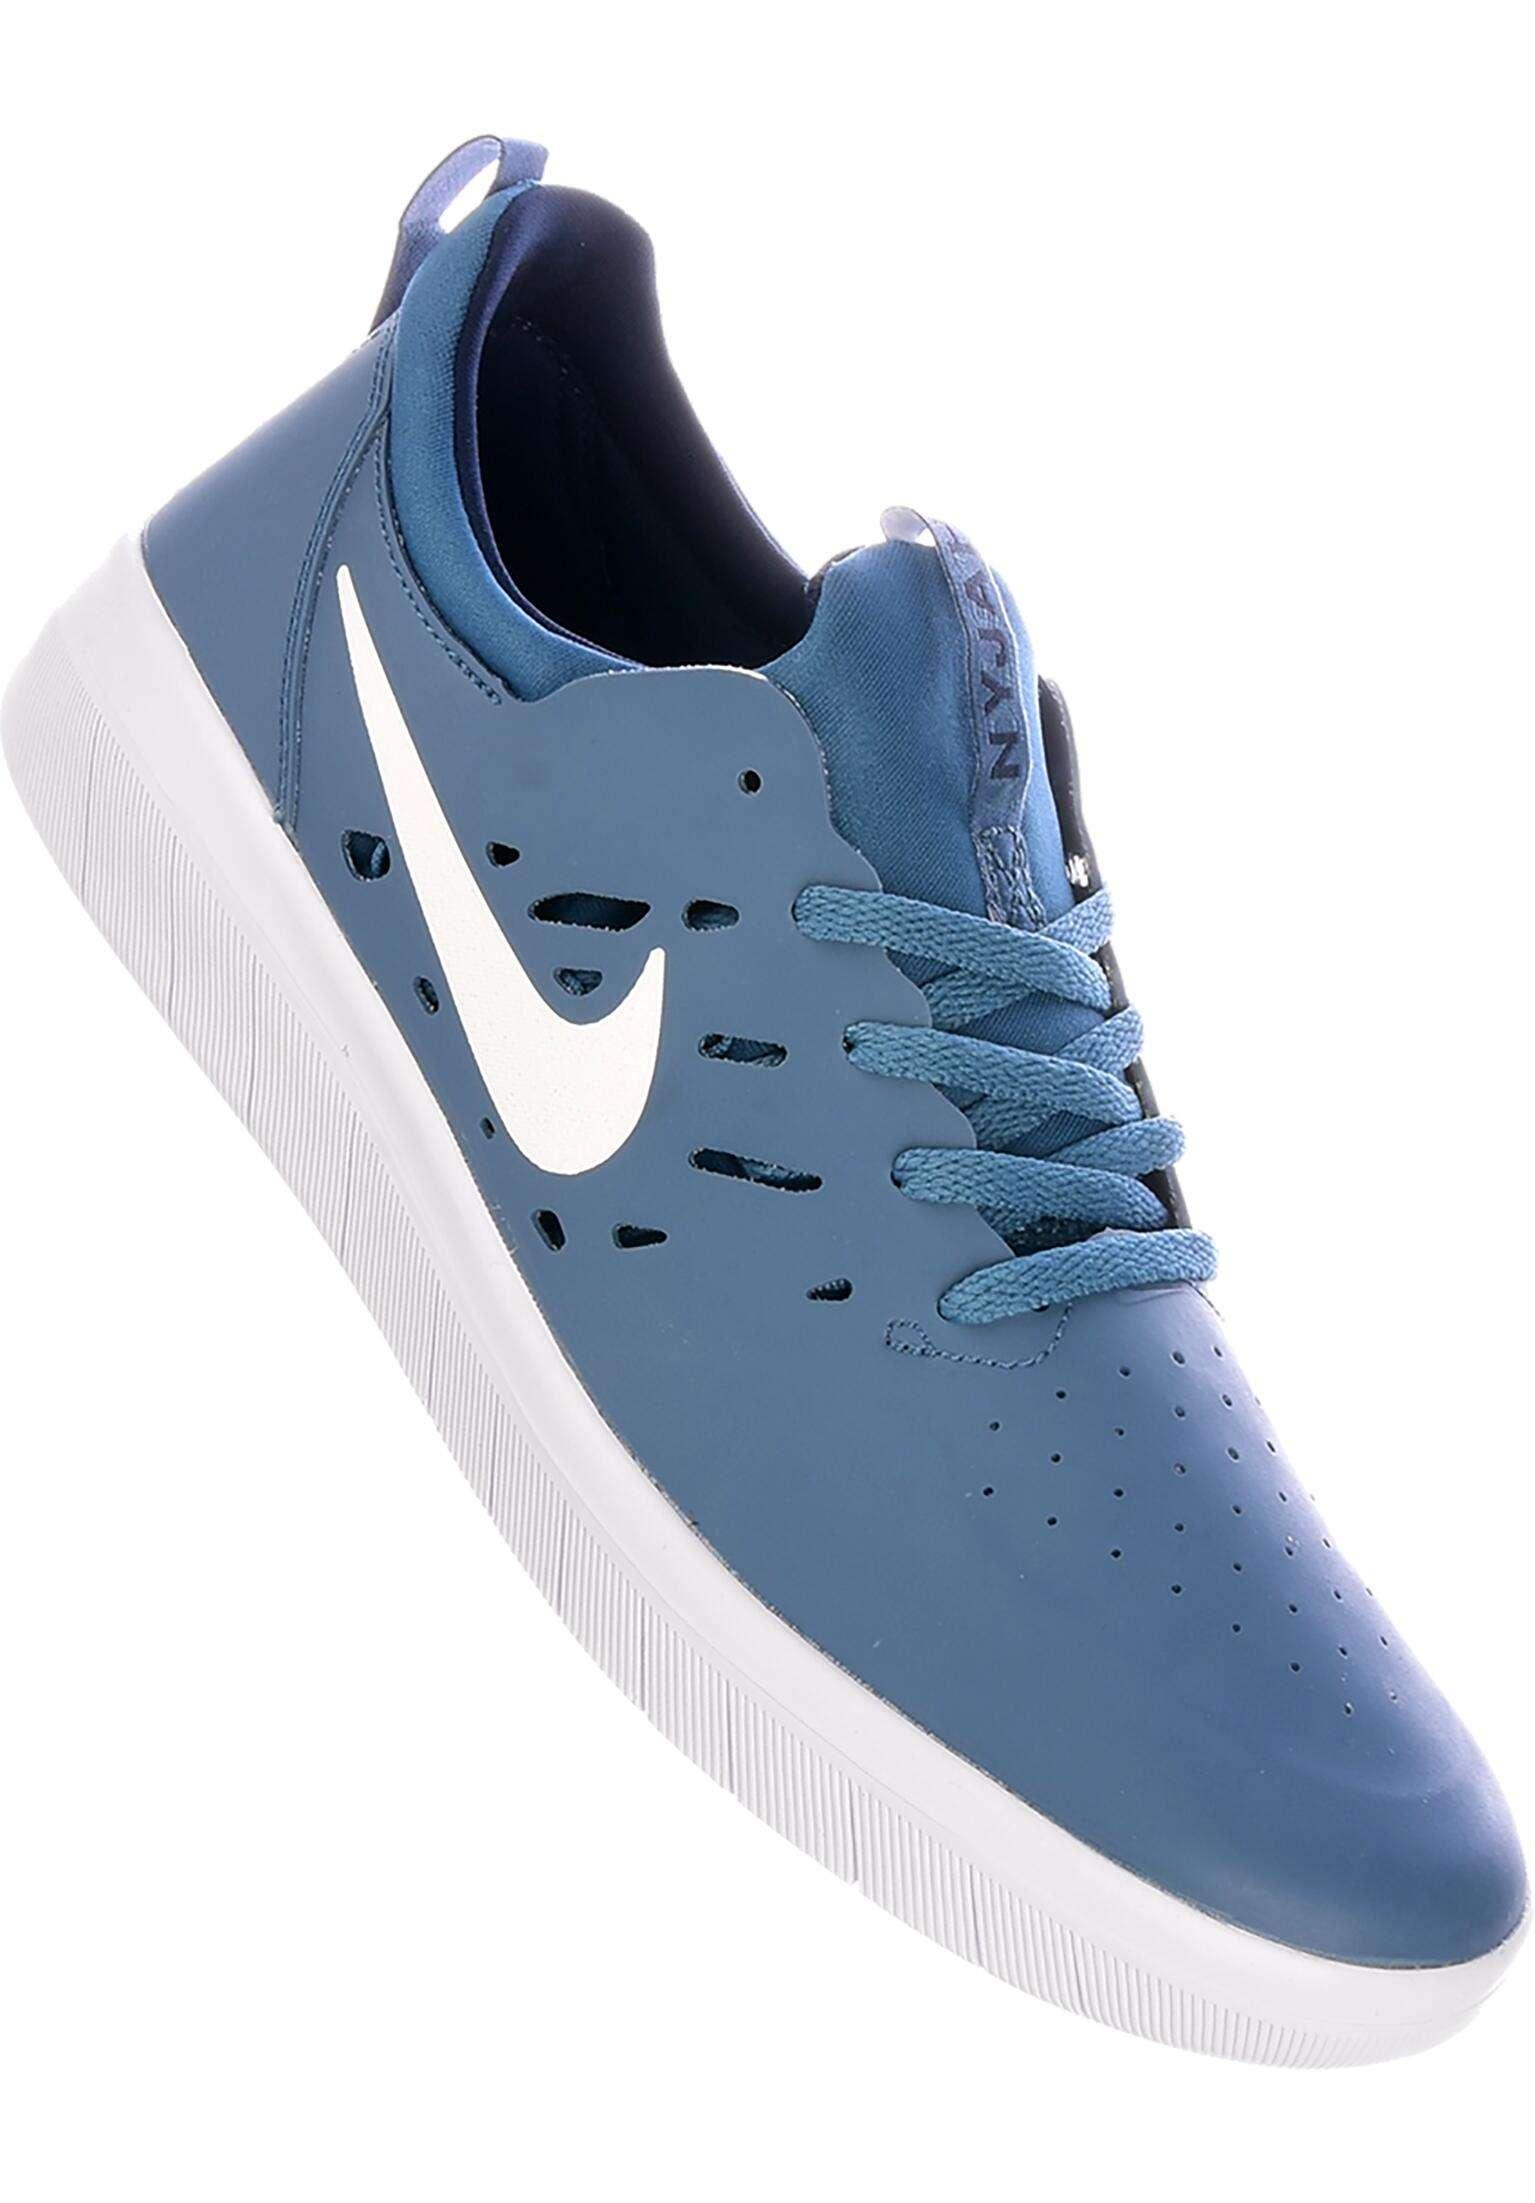 a few days away sells sells Nike SB Nyjah Free Skateboarding